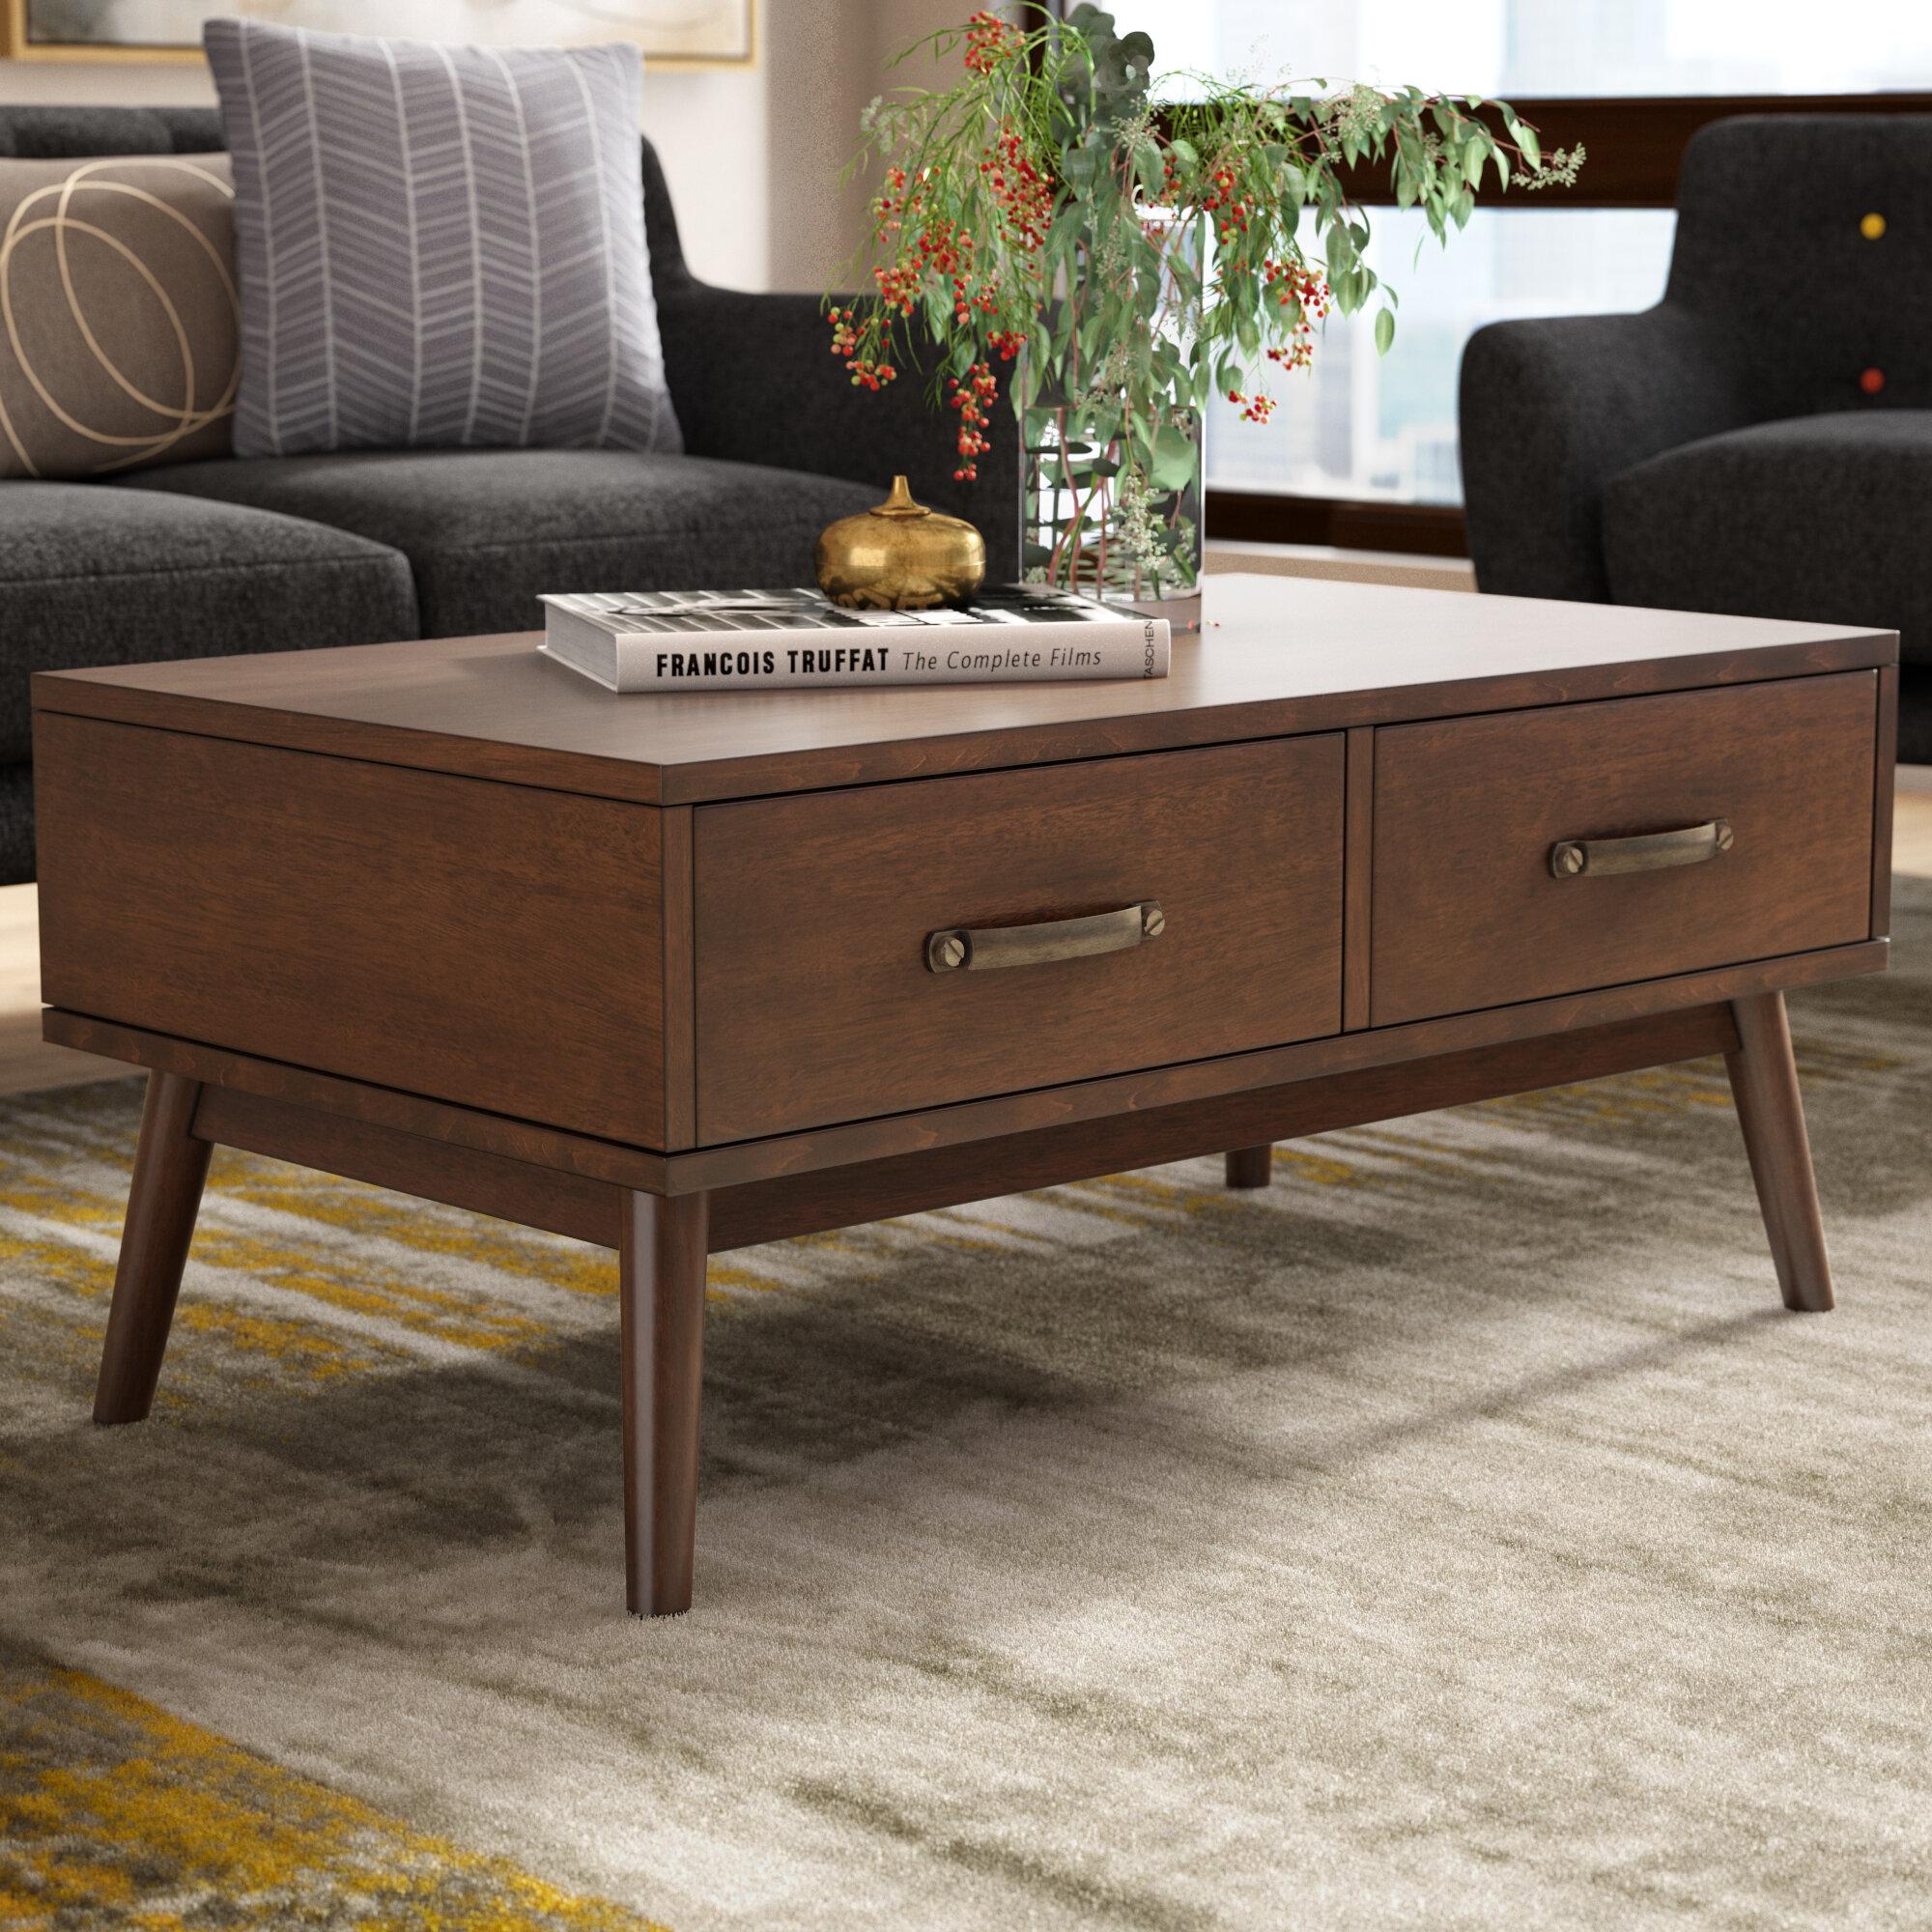 Ripton Mid Century Modern Coffee Table Reviews Joss Main